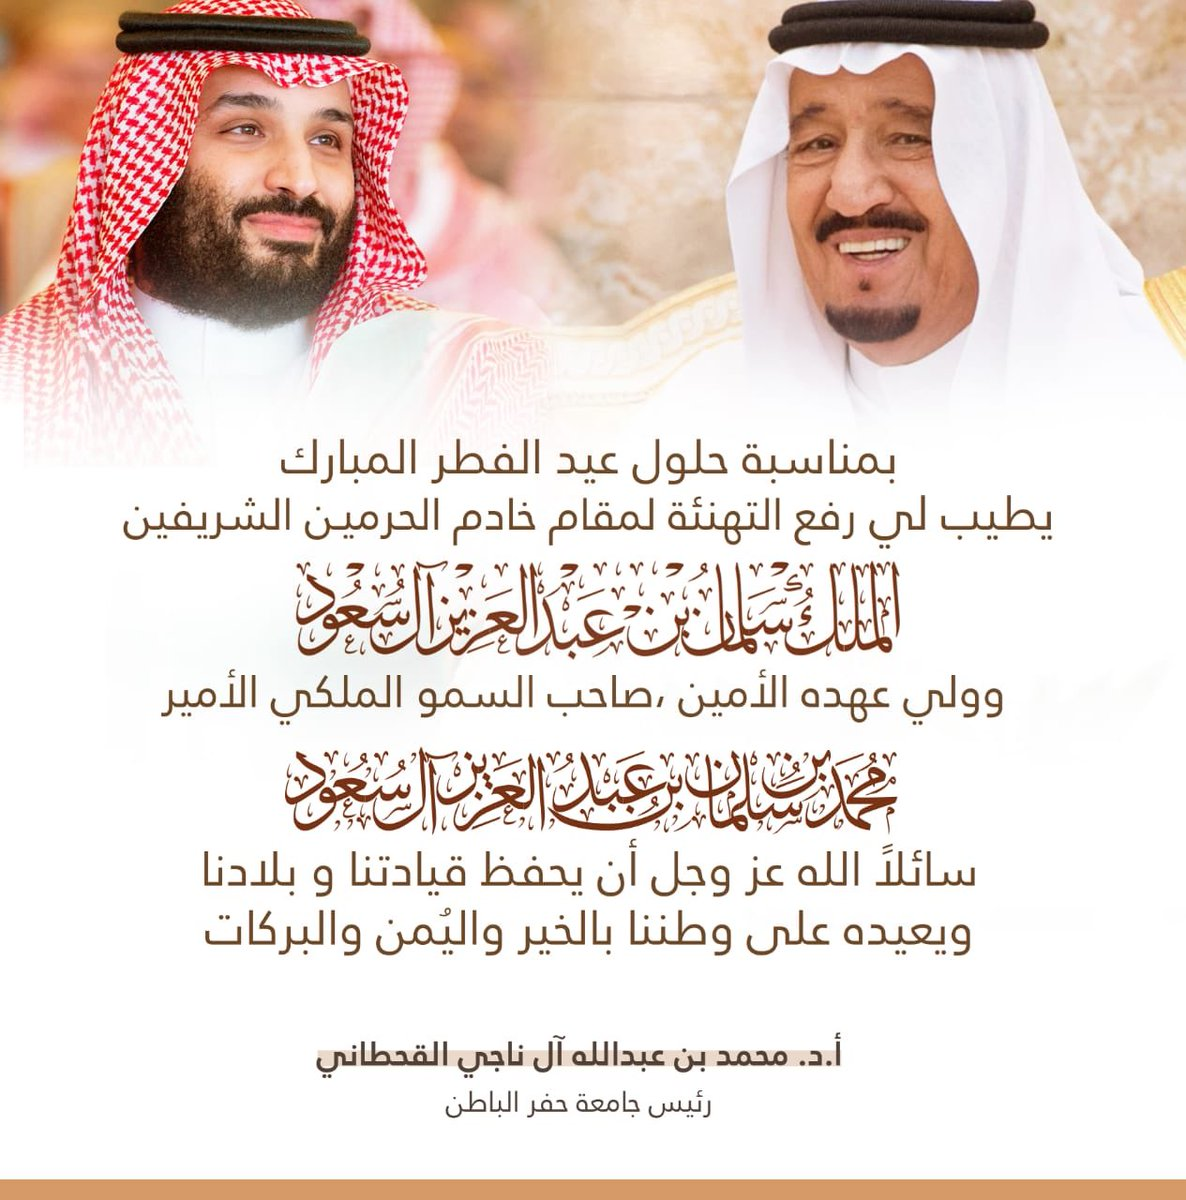 د. سعيد سعد هادي القحطاني (@DrAlnabs)